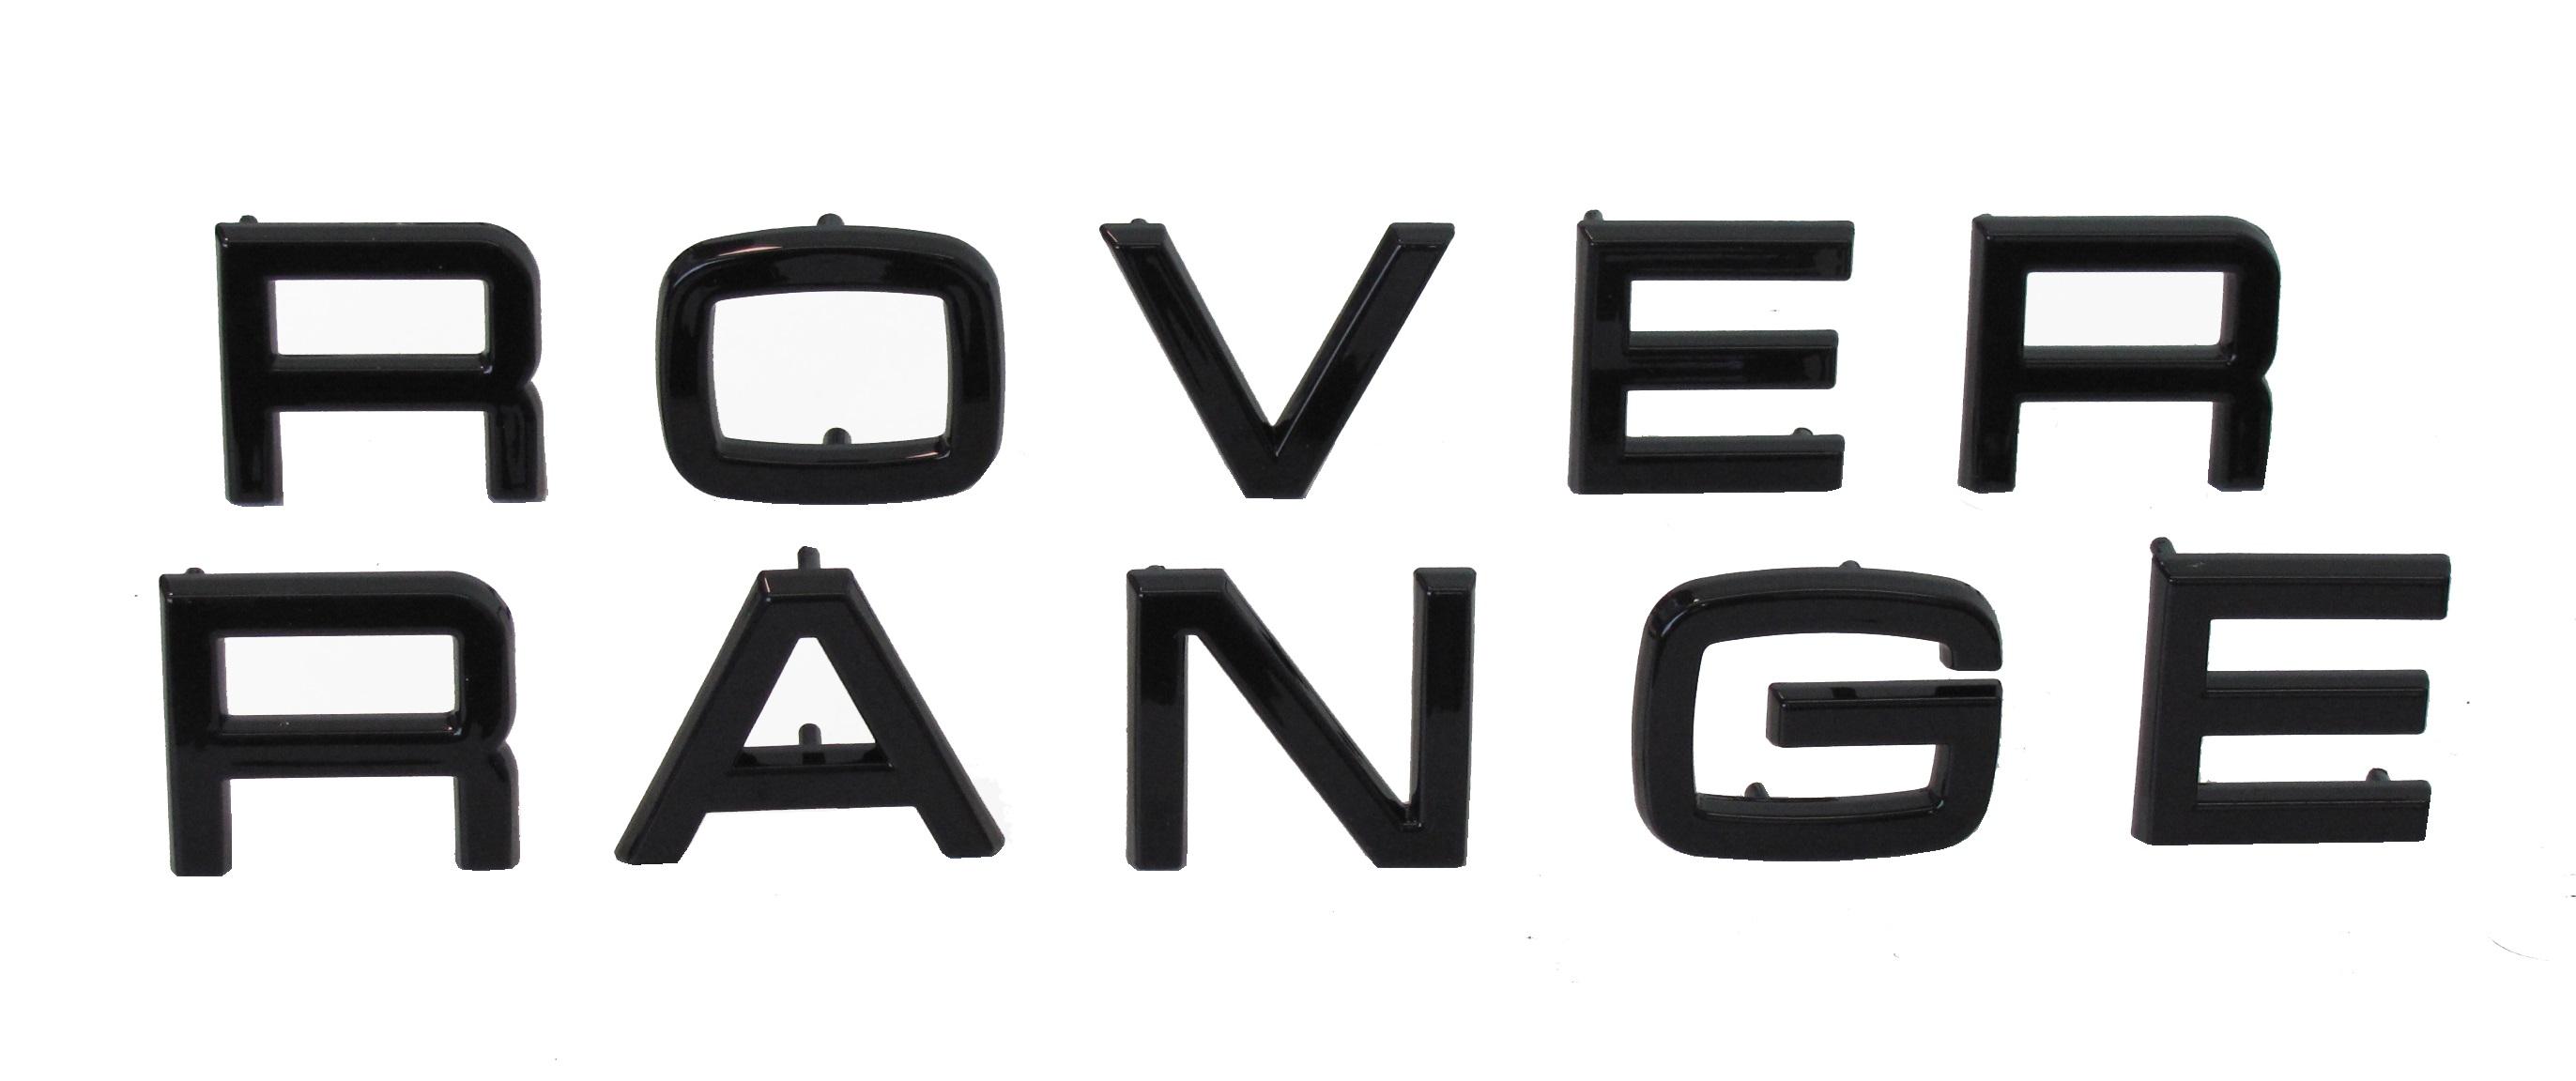 Black Lettering Original Pin Type Range Rover Classic